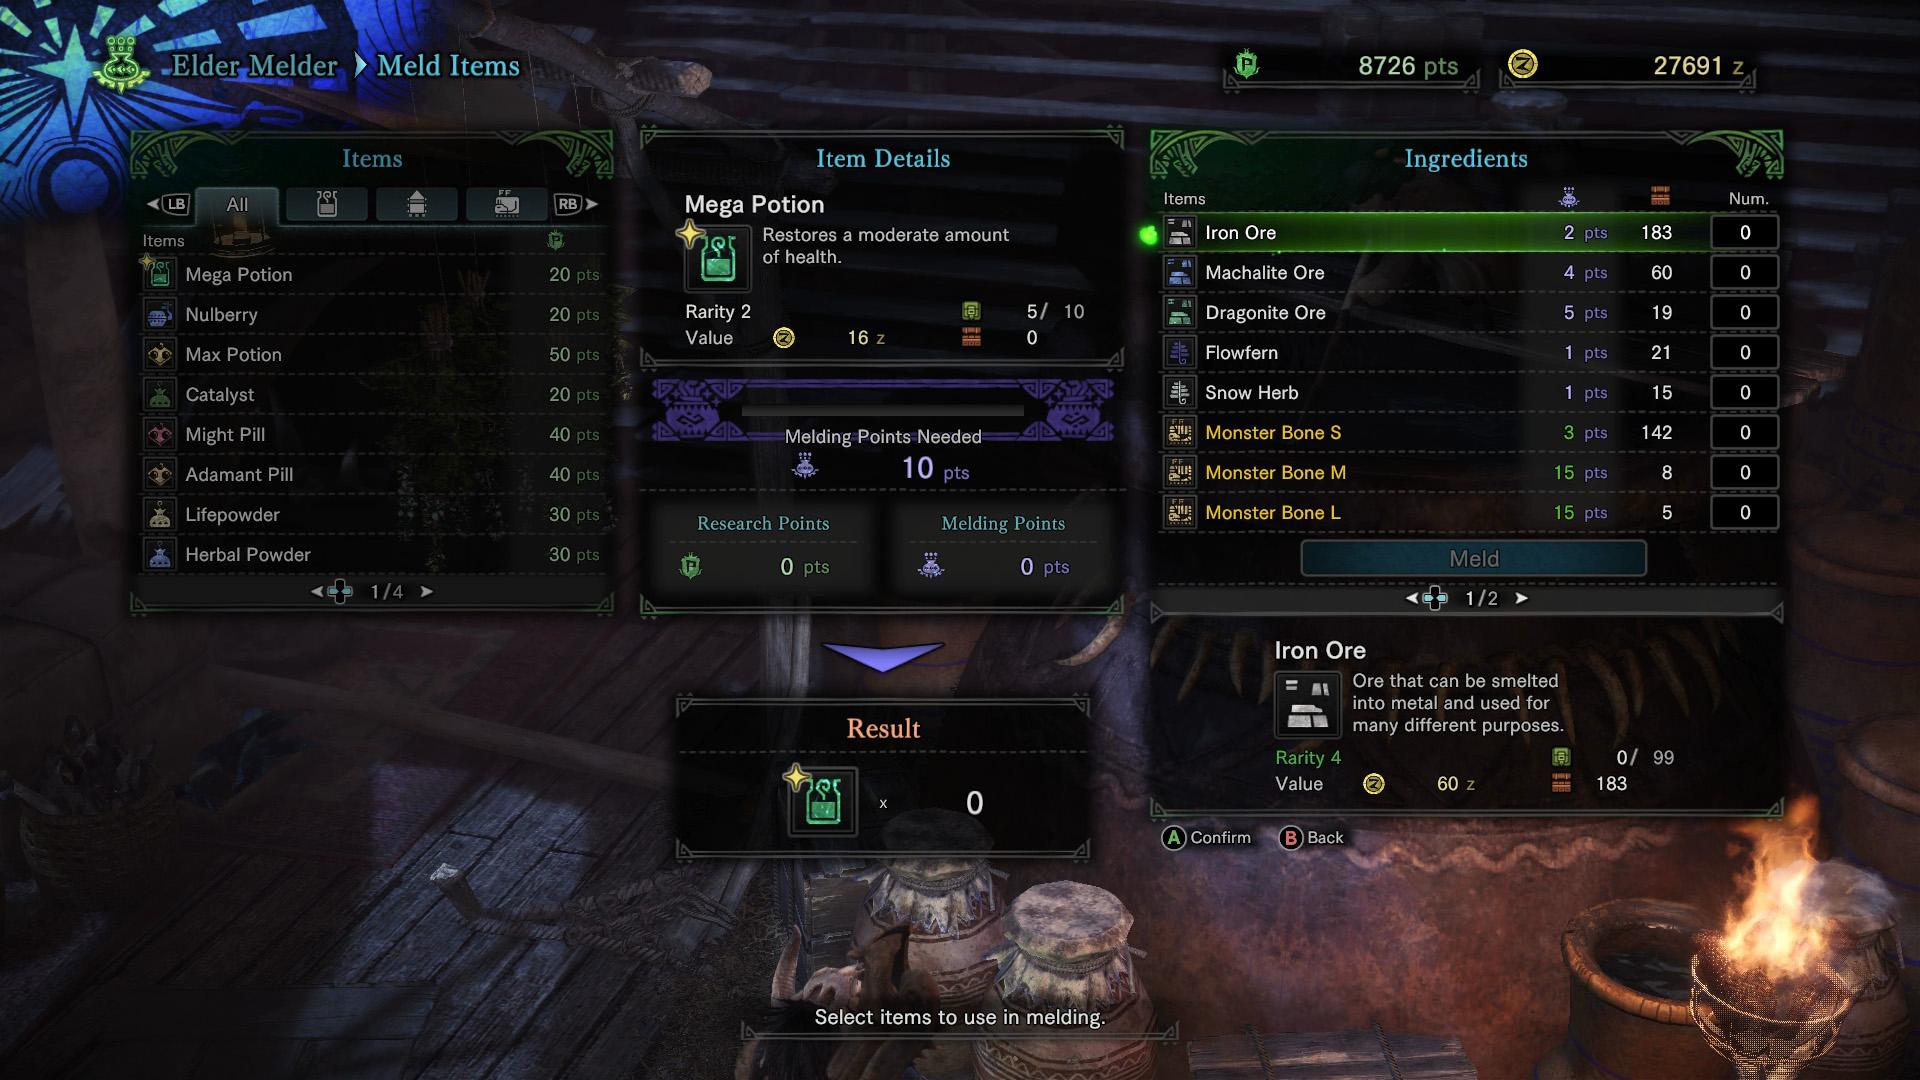 Mhw Inventory Editor